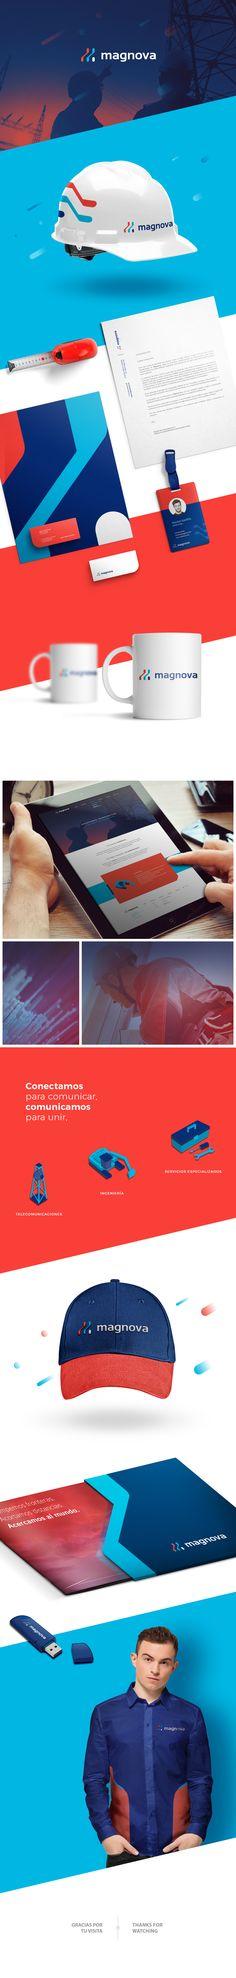 Naming and visual identity for Magnova, a telecommunications company. Nombre y diseño de identidad visual para magnova, empresa de telecomunicaciones en Puebla. BRANDING, IDENTITY, TECHNOLOGY, LOGO, CORPORATE, CONSTRUCTORA, COMUNICACIÓN, COMUNICATION, TECNOLOGIA, DISEÑO GRÁFICO, graphic design, https://www.behance.net/gallery/66308095/Magnova